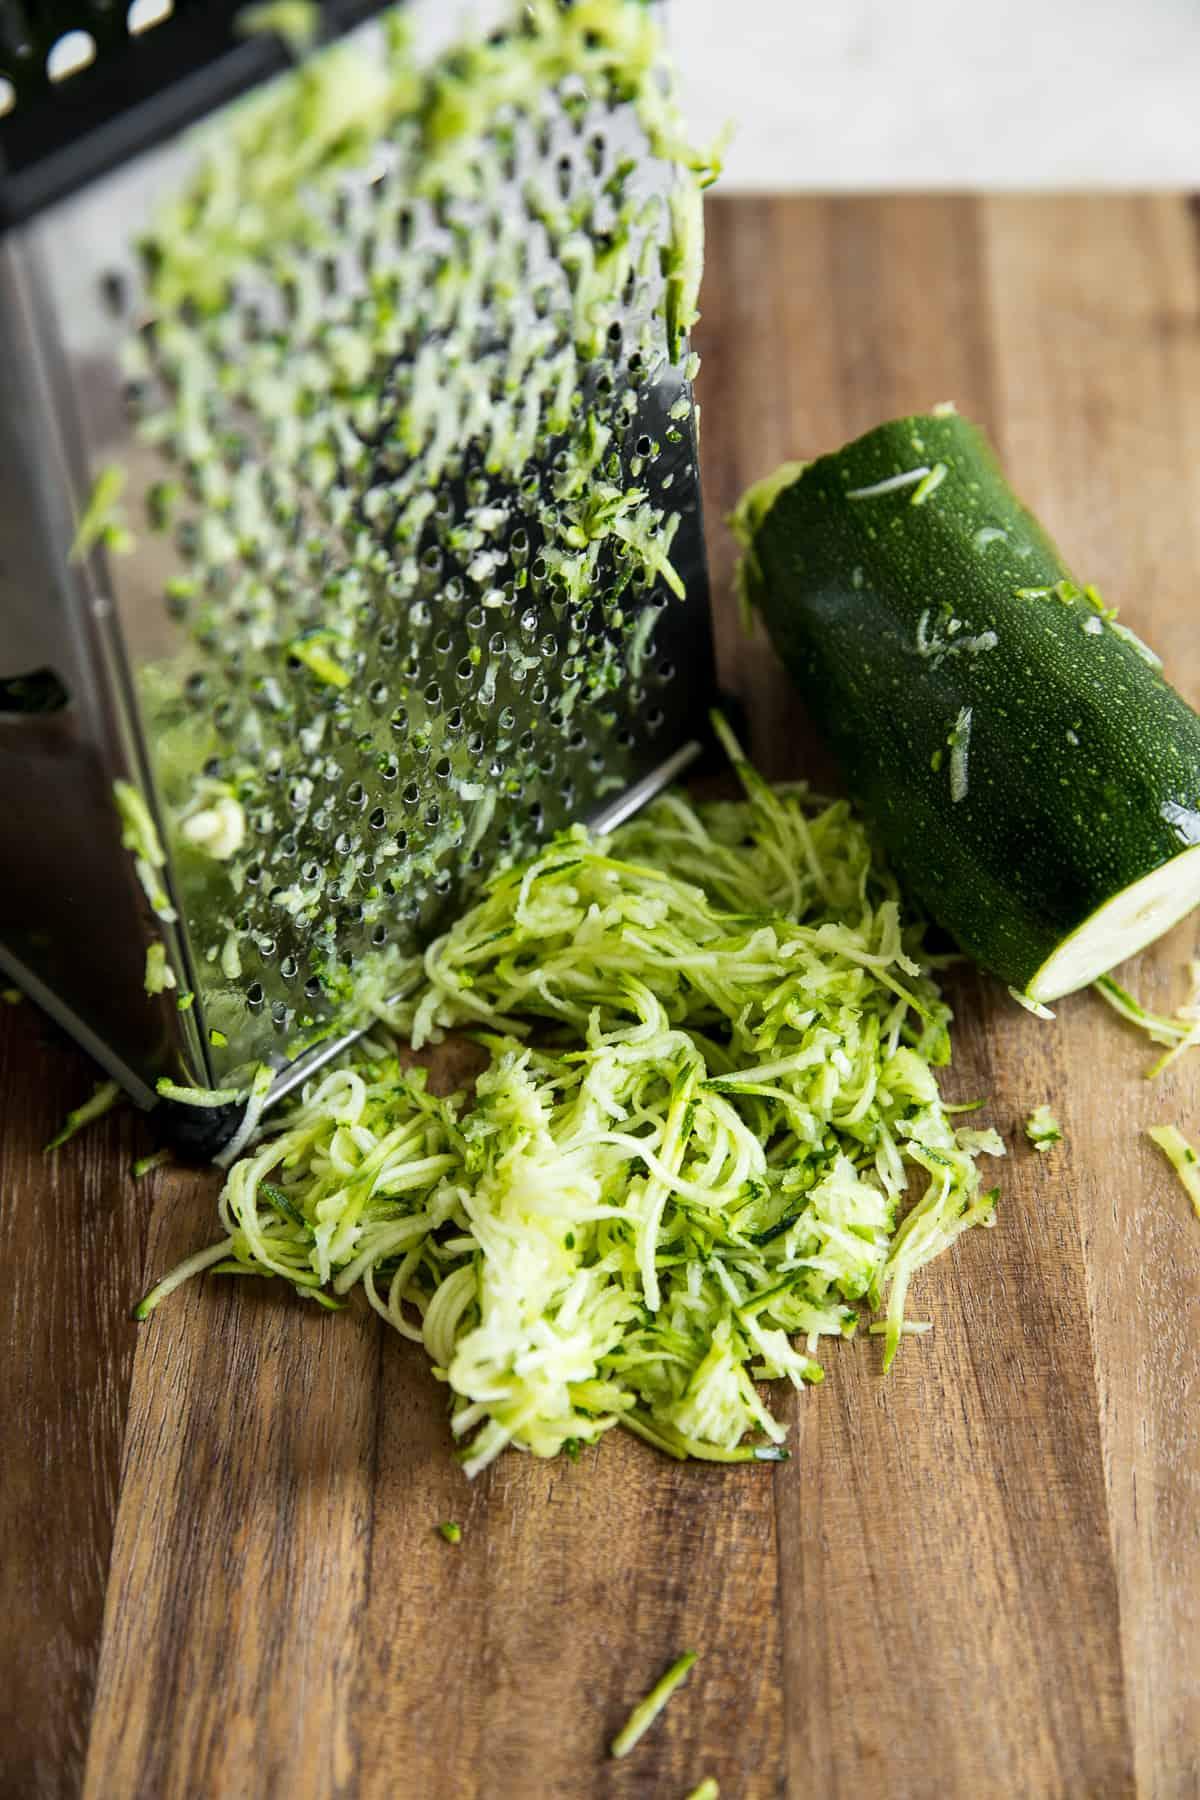 shredded zucchini next to box grater and cut zucchini